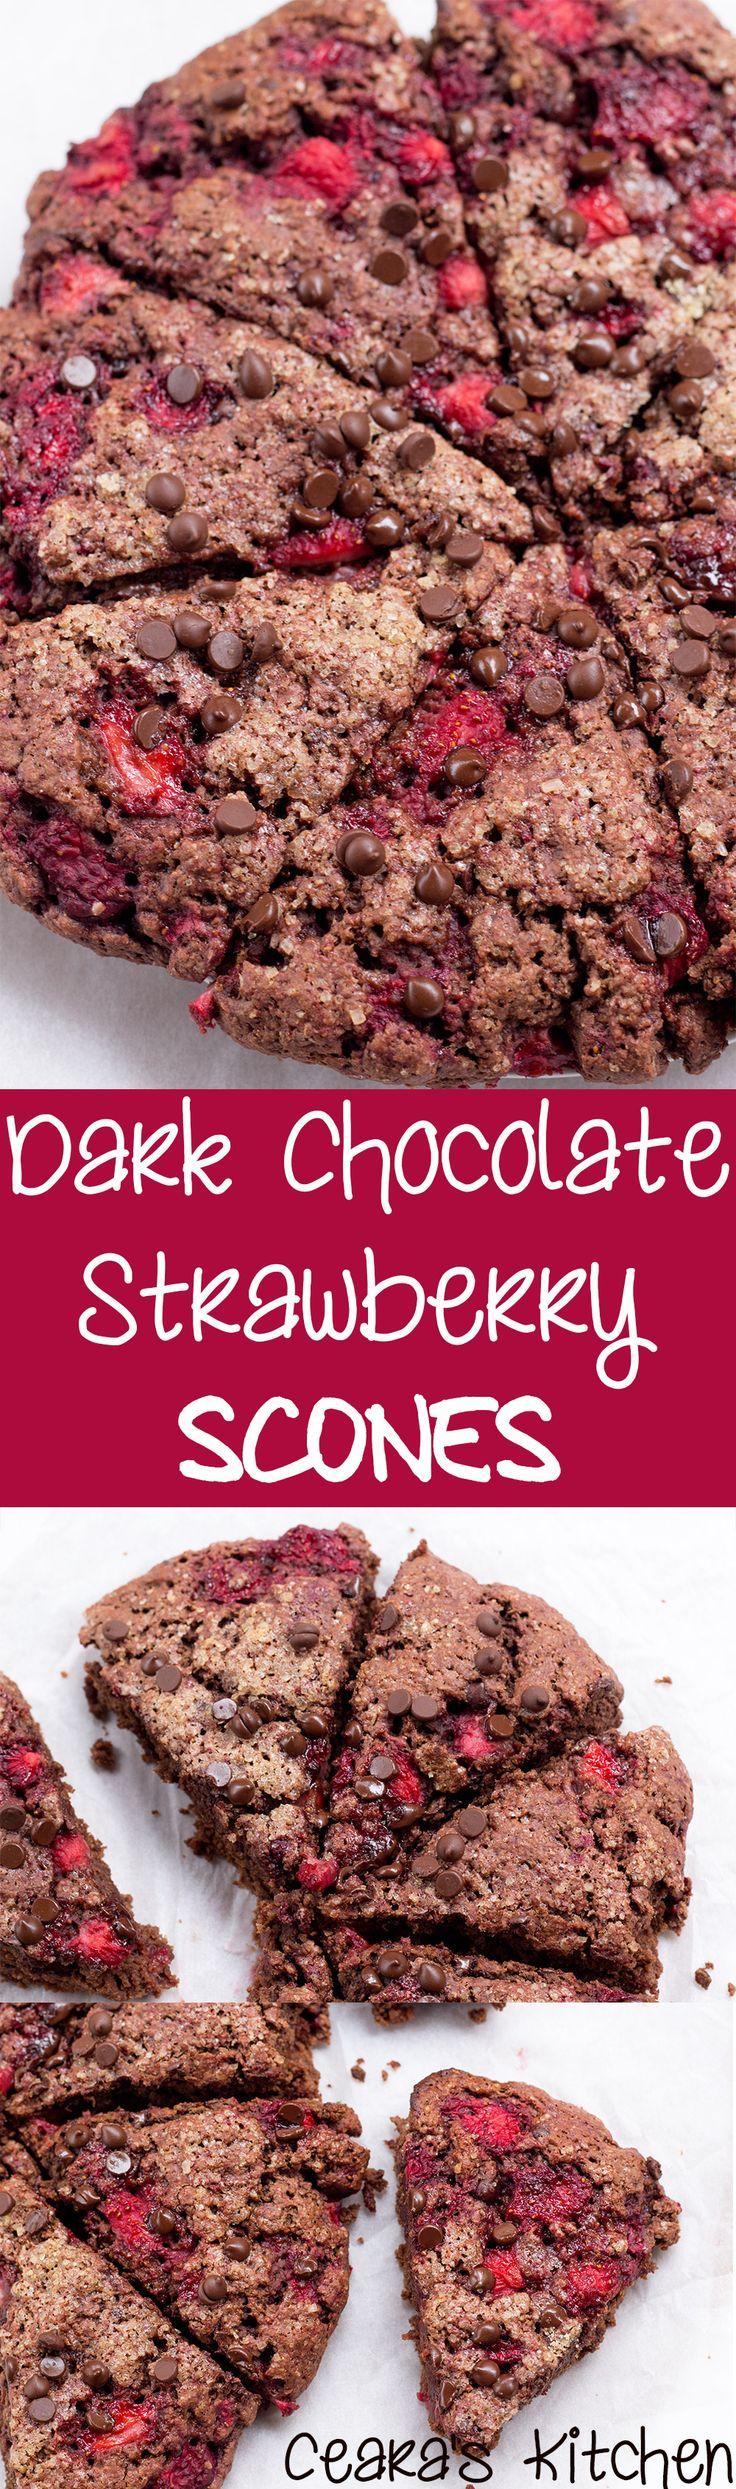 Dark Chocolate Strawberry Scones